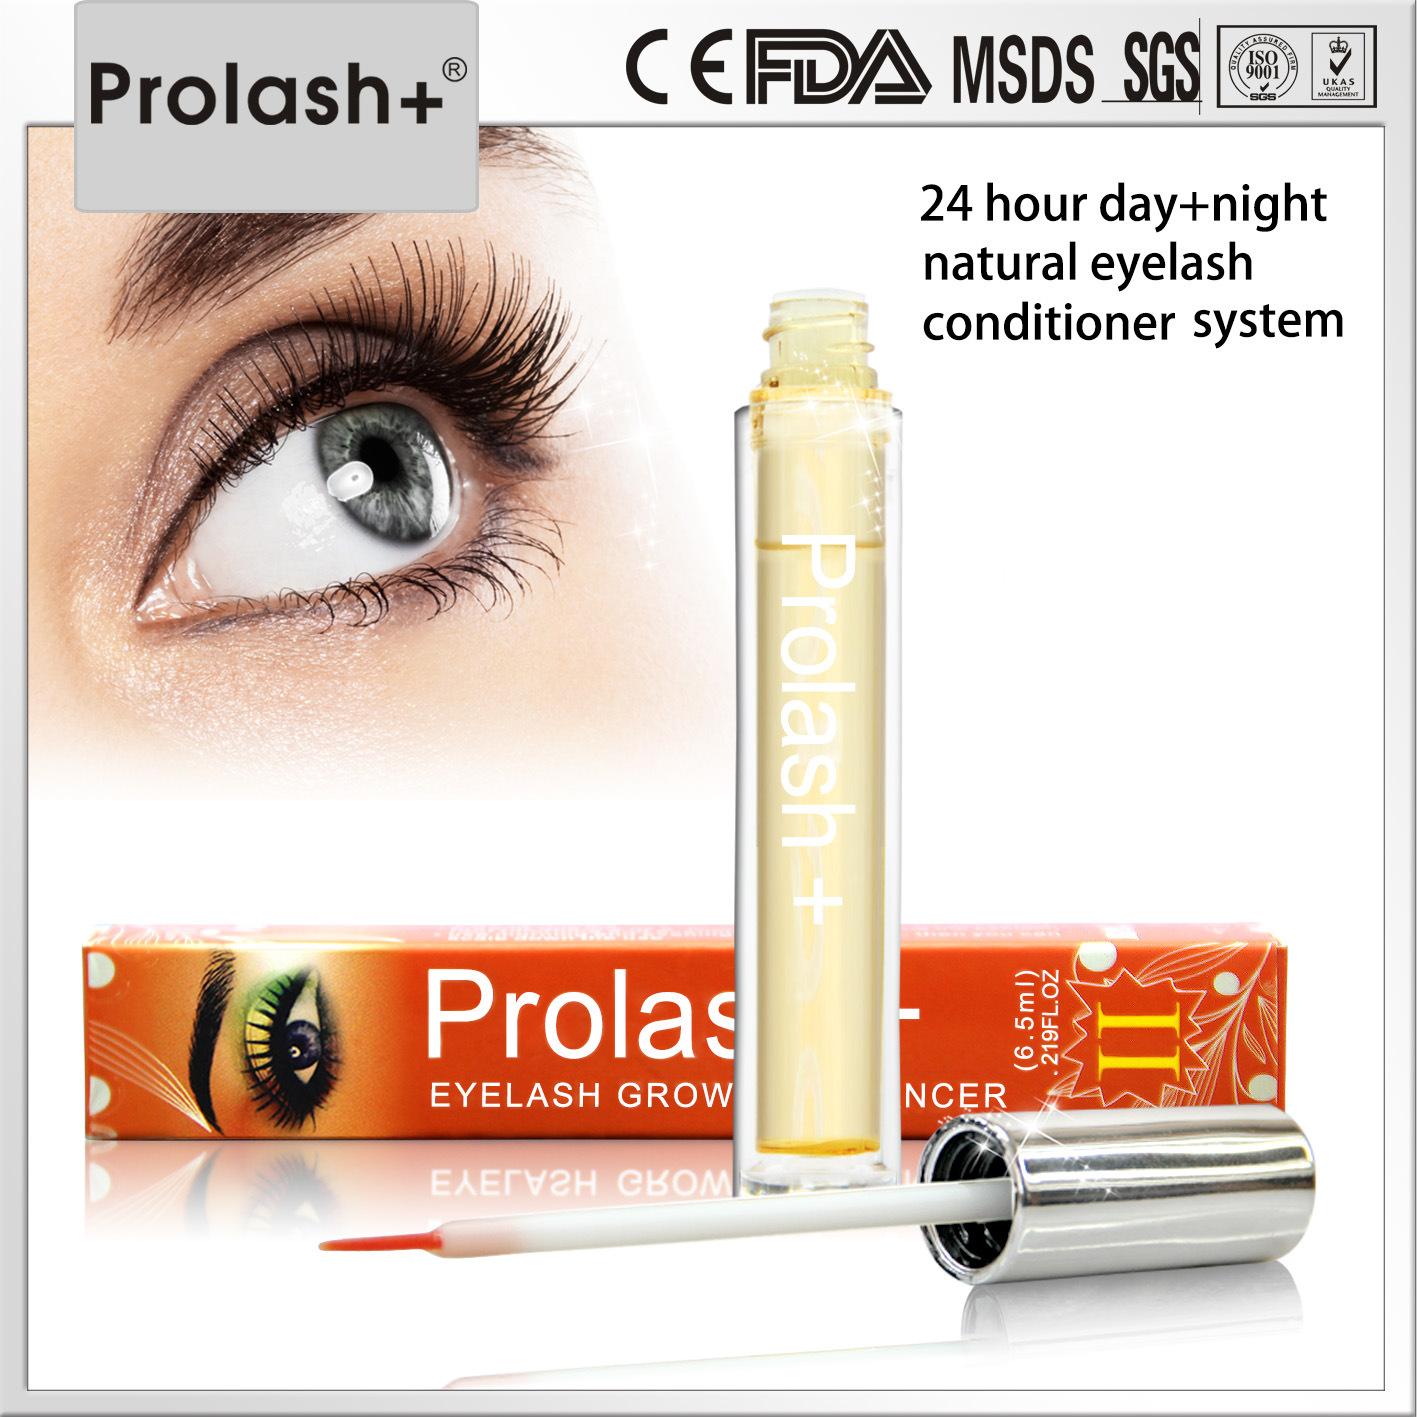 China Comestics 2016 Best Selling Natural Pprlash Eyelash Growth